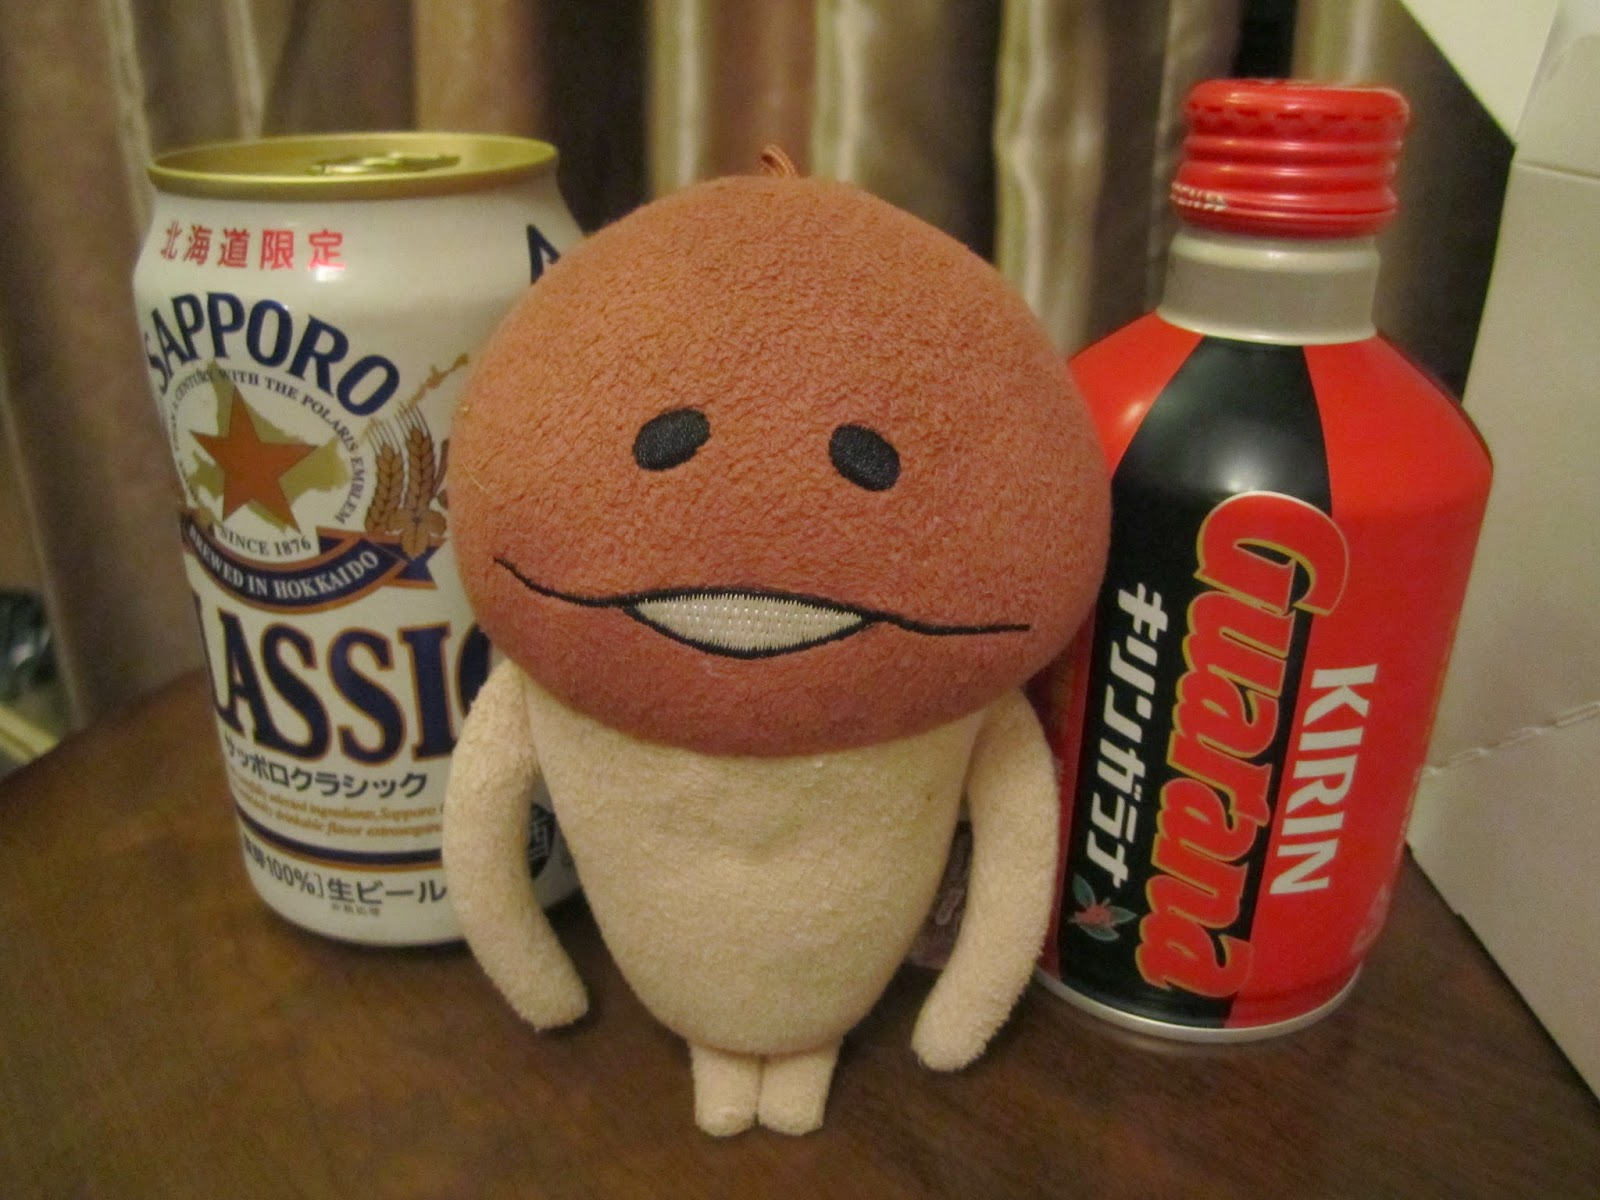 Classic Sapporo Beer and Kirin Guarana soda